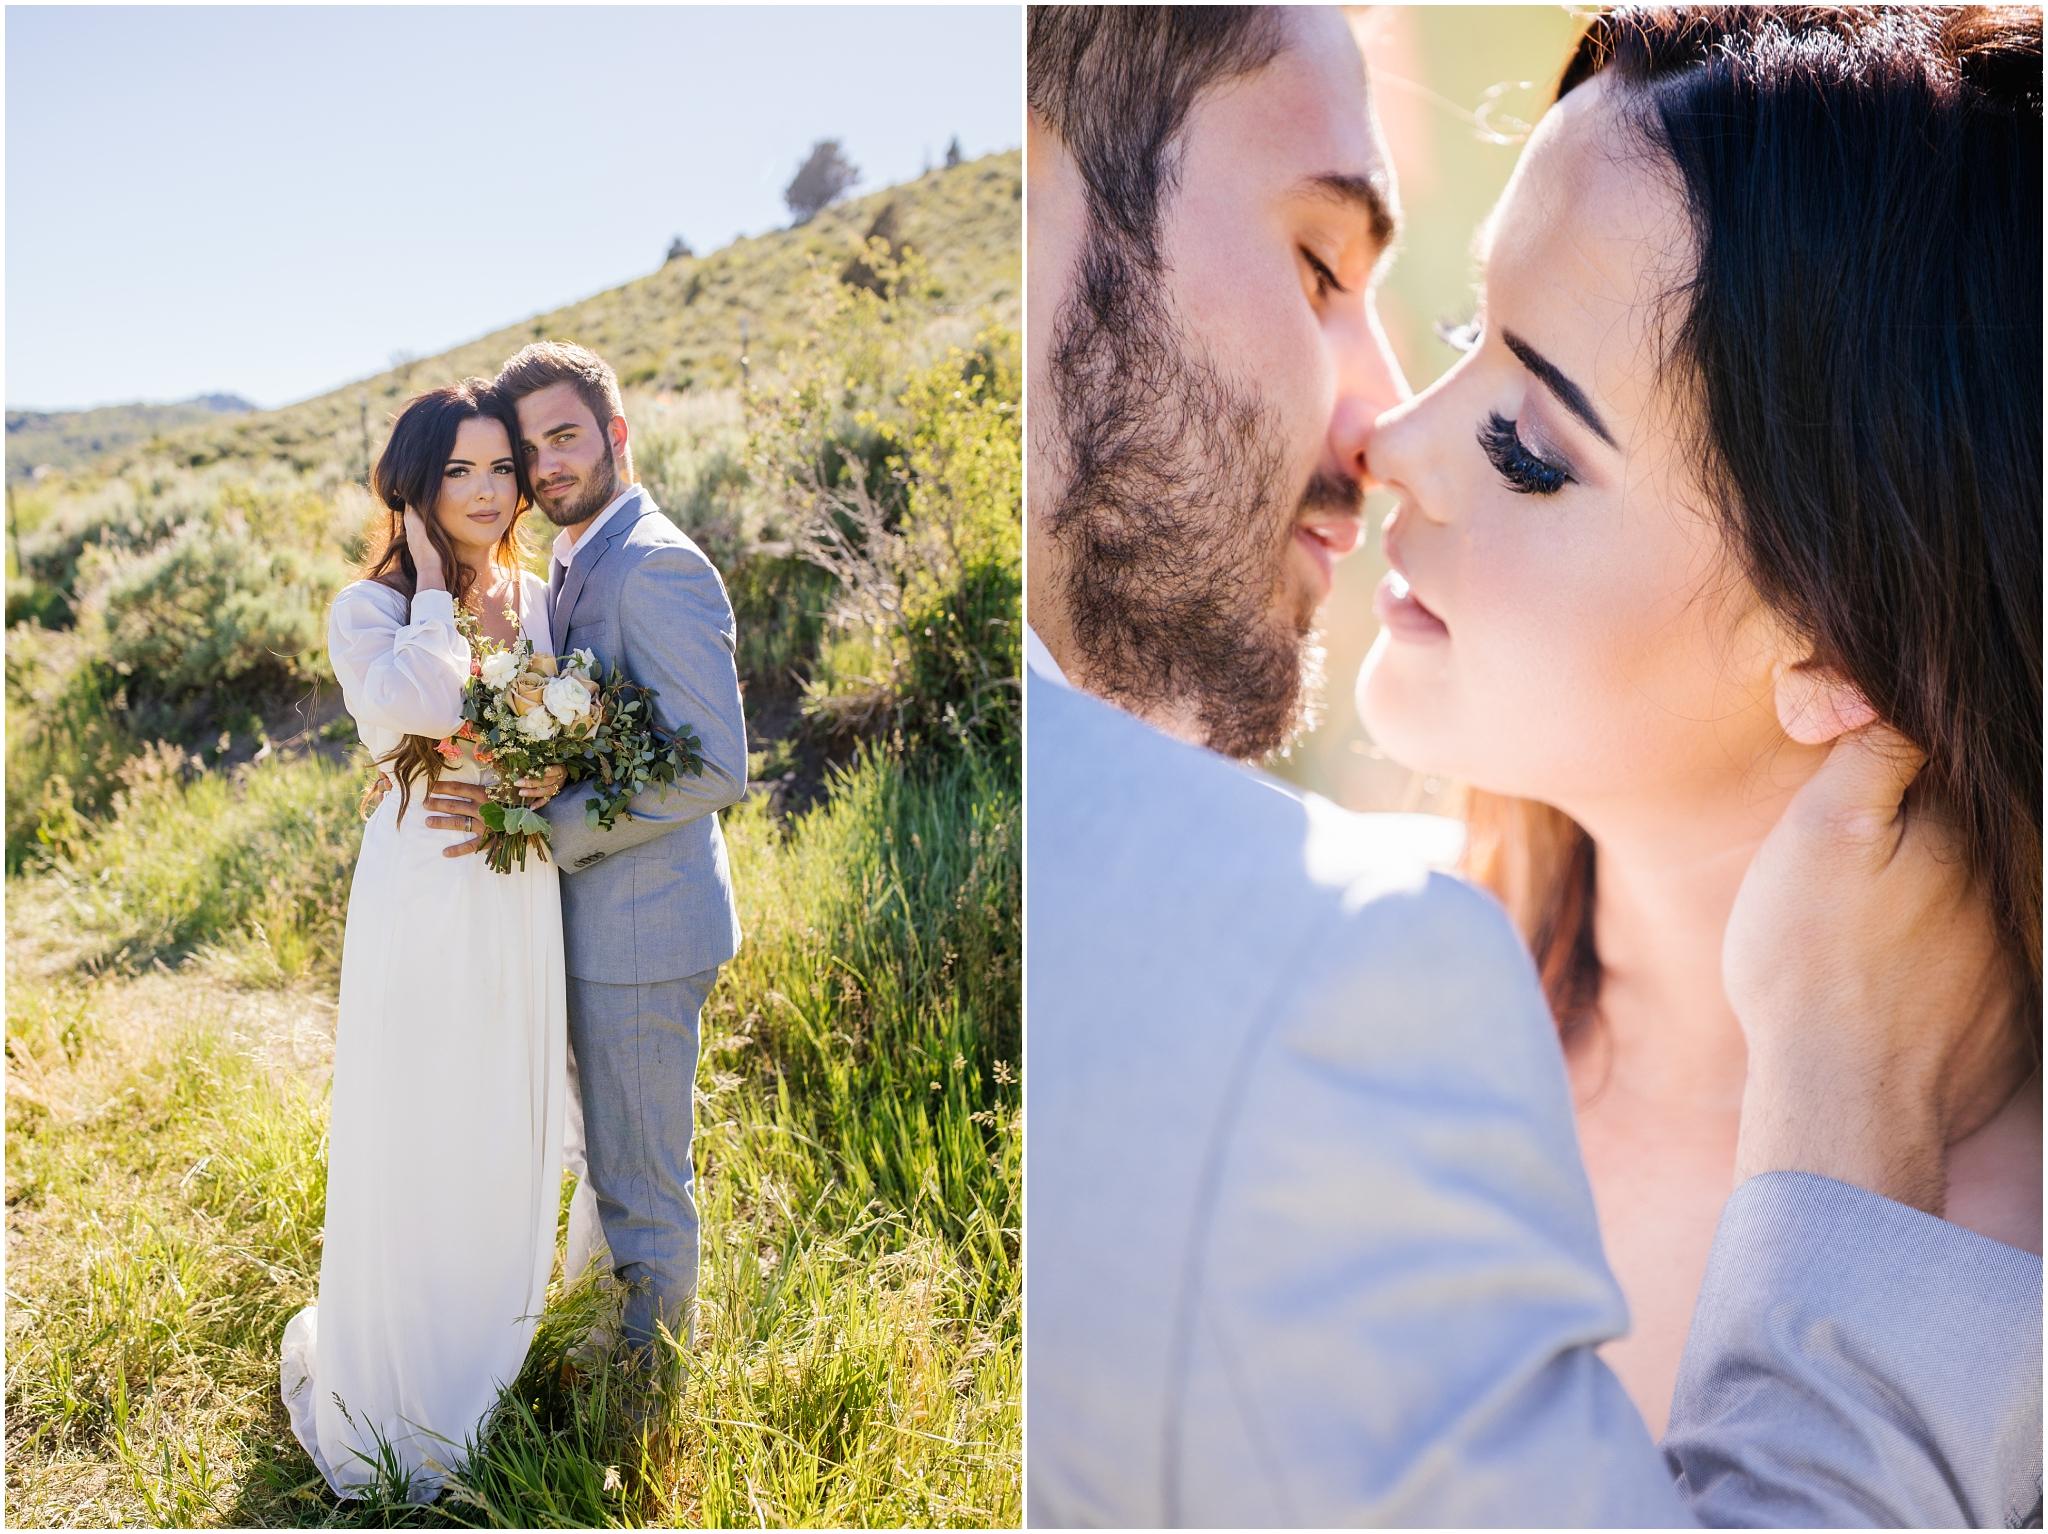 MountainShoot-38_Lizzie-B-Imagery-Utah-Wedding-Photographer-Salt-Lake-City-Park-City-Utah-County.jpg